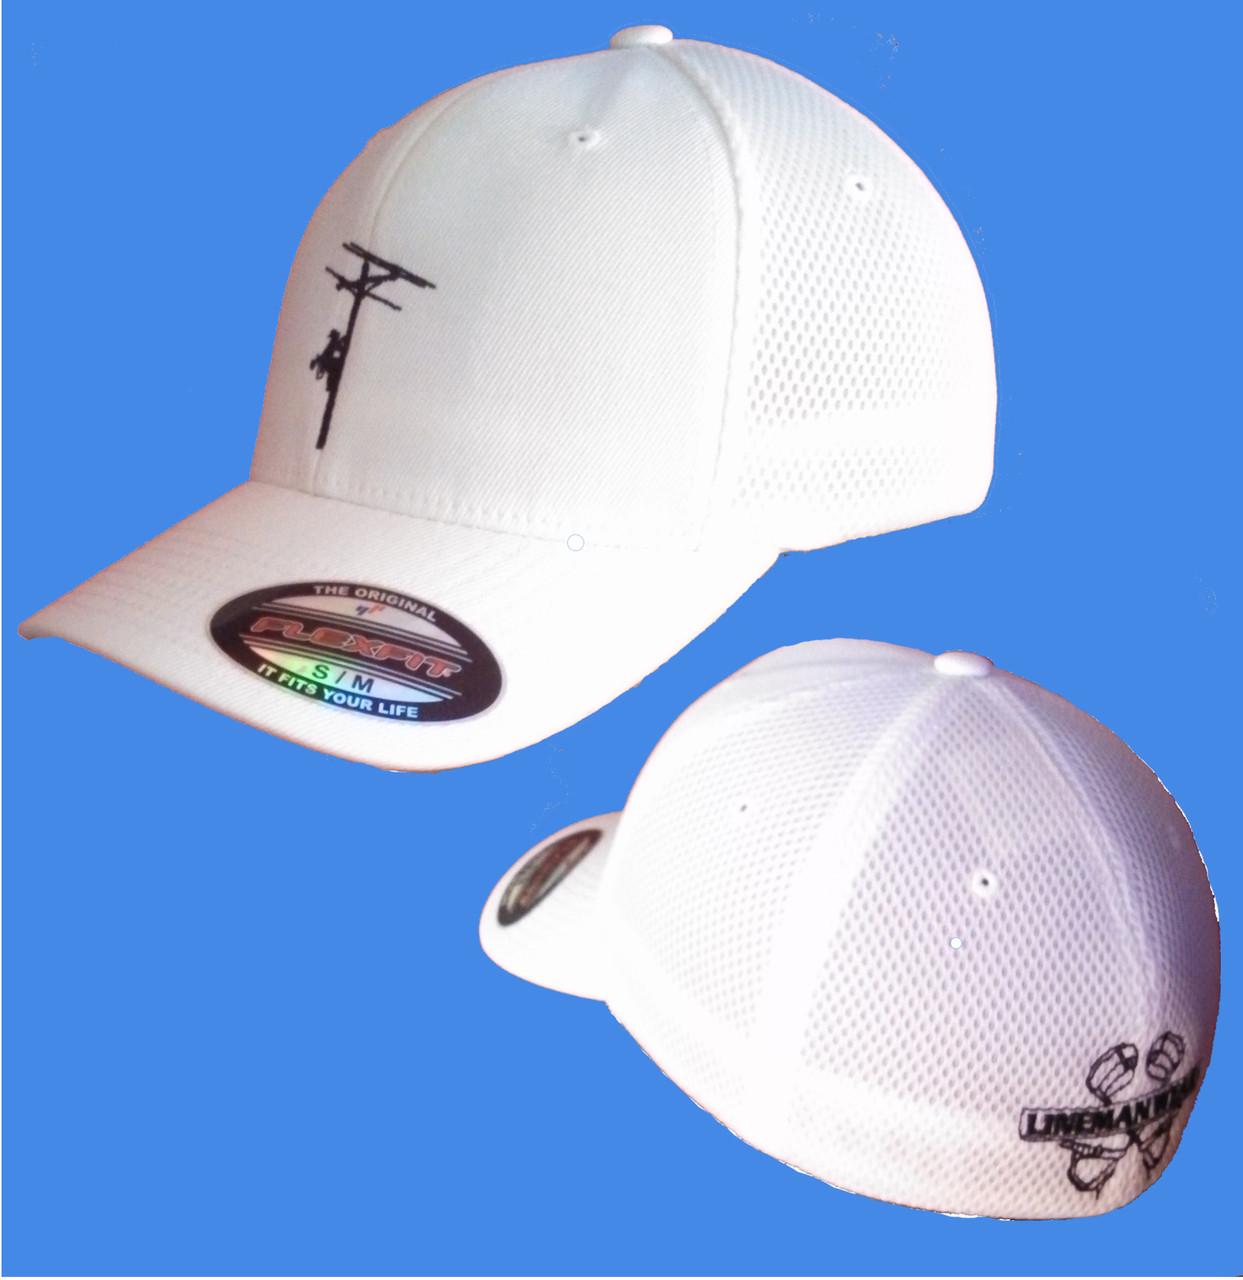 291d7b428ae Flexfit Ultra fiber and Mesh Cap (White) - Lineman Wear